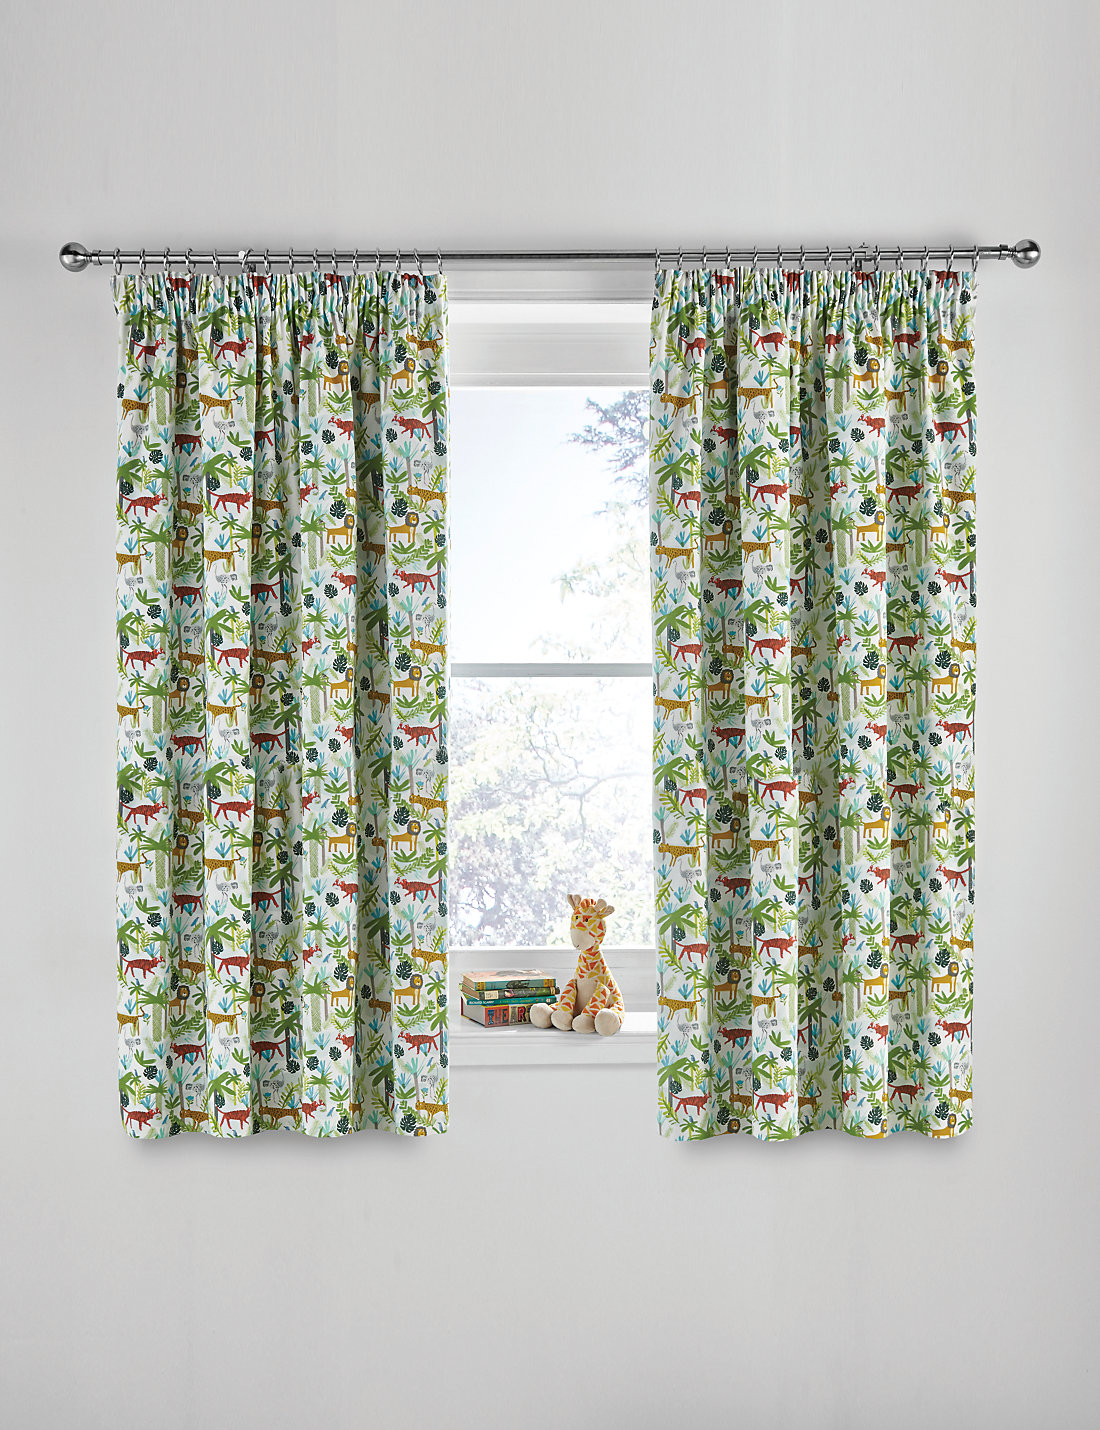 Jungle nursery curtains uk curtain menzilperde net for Nursery curtains uk